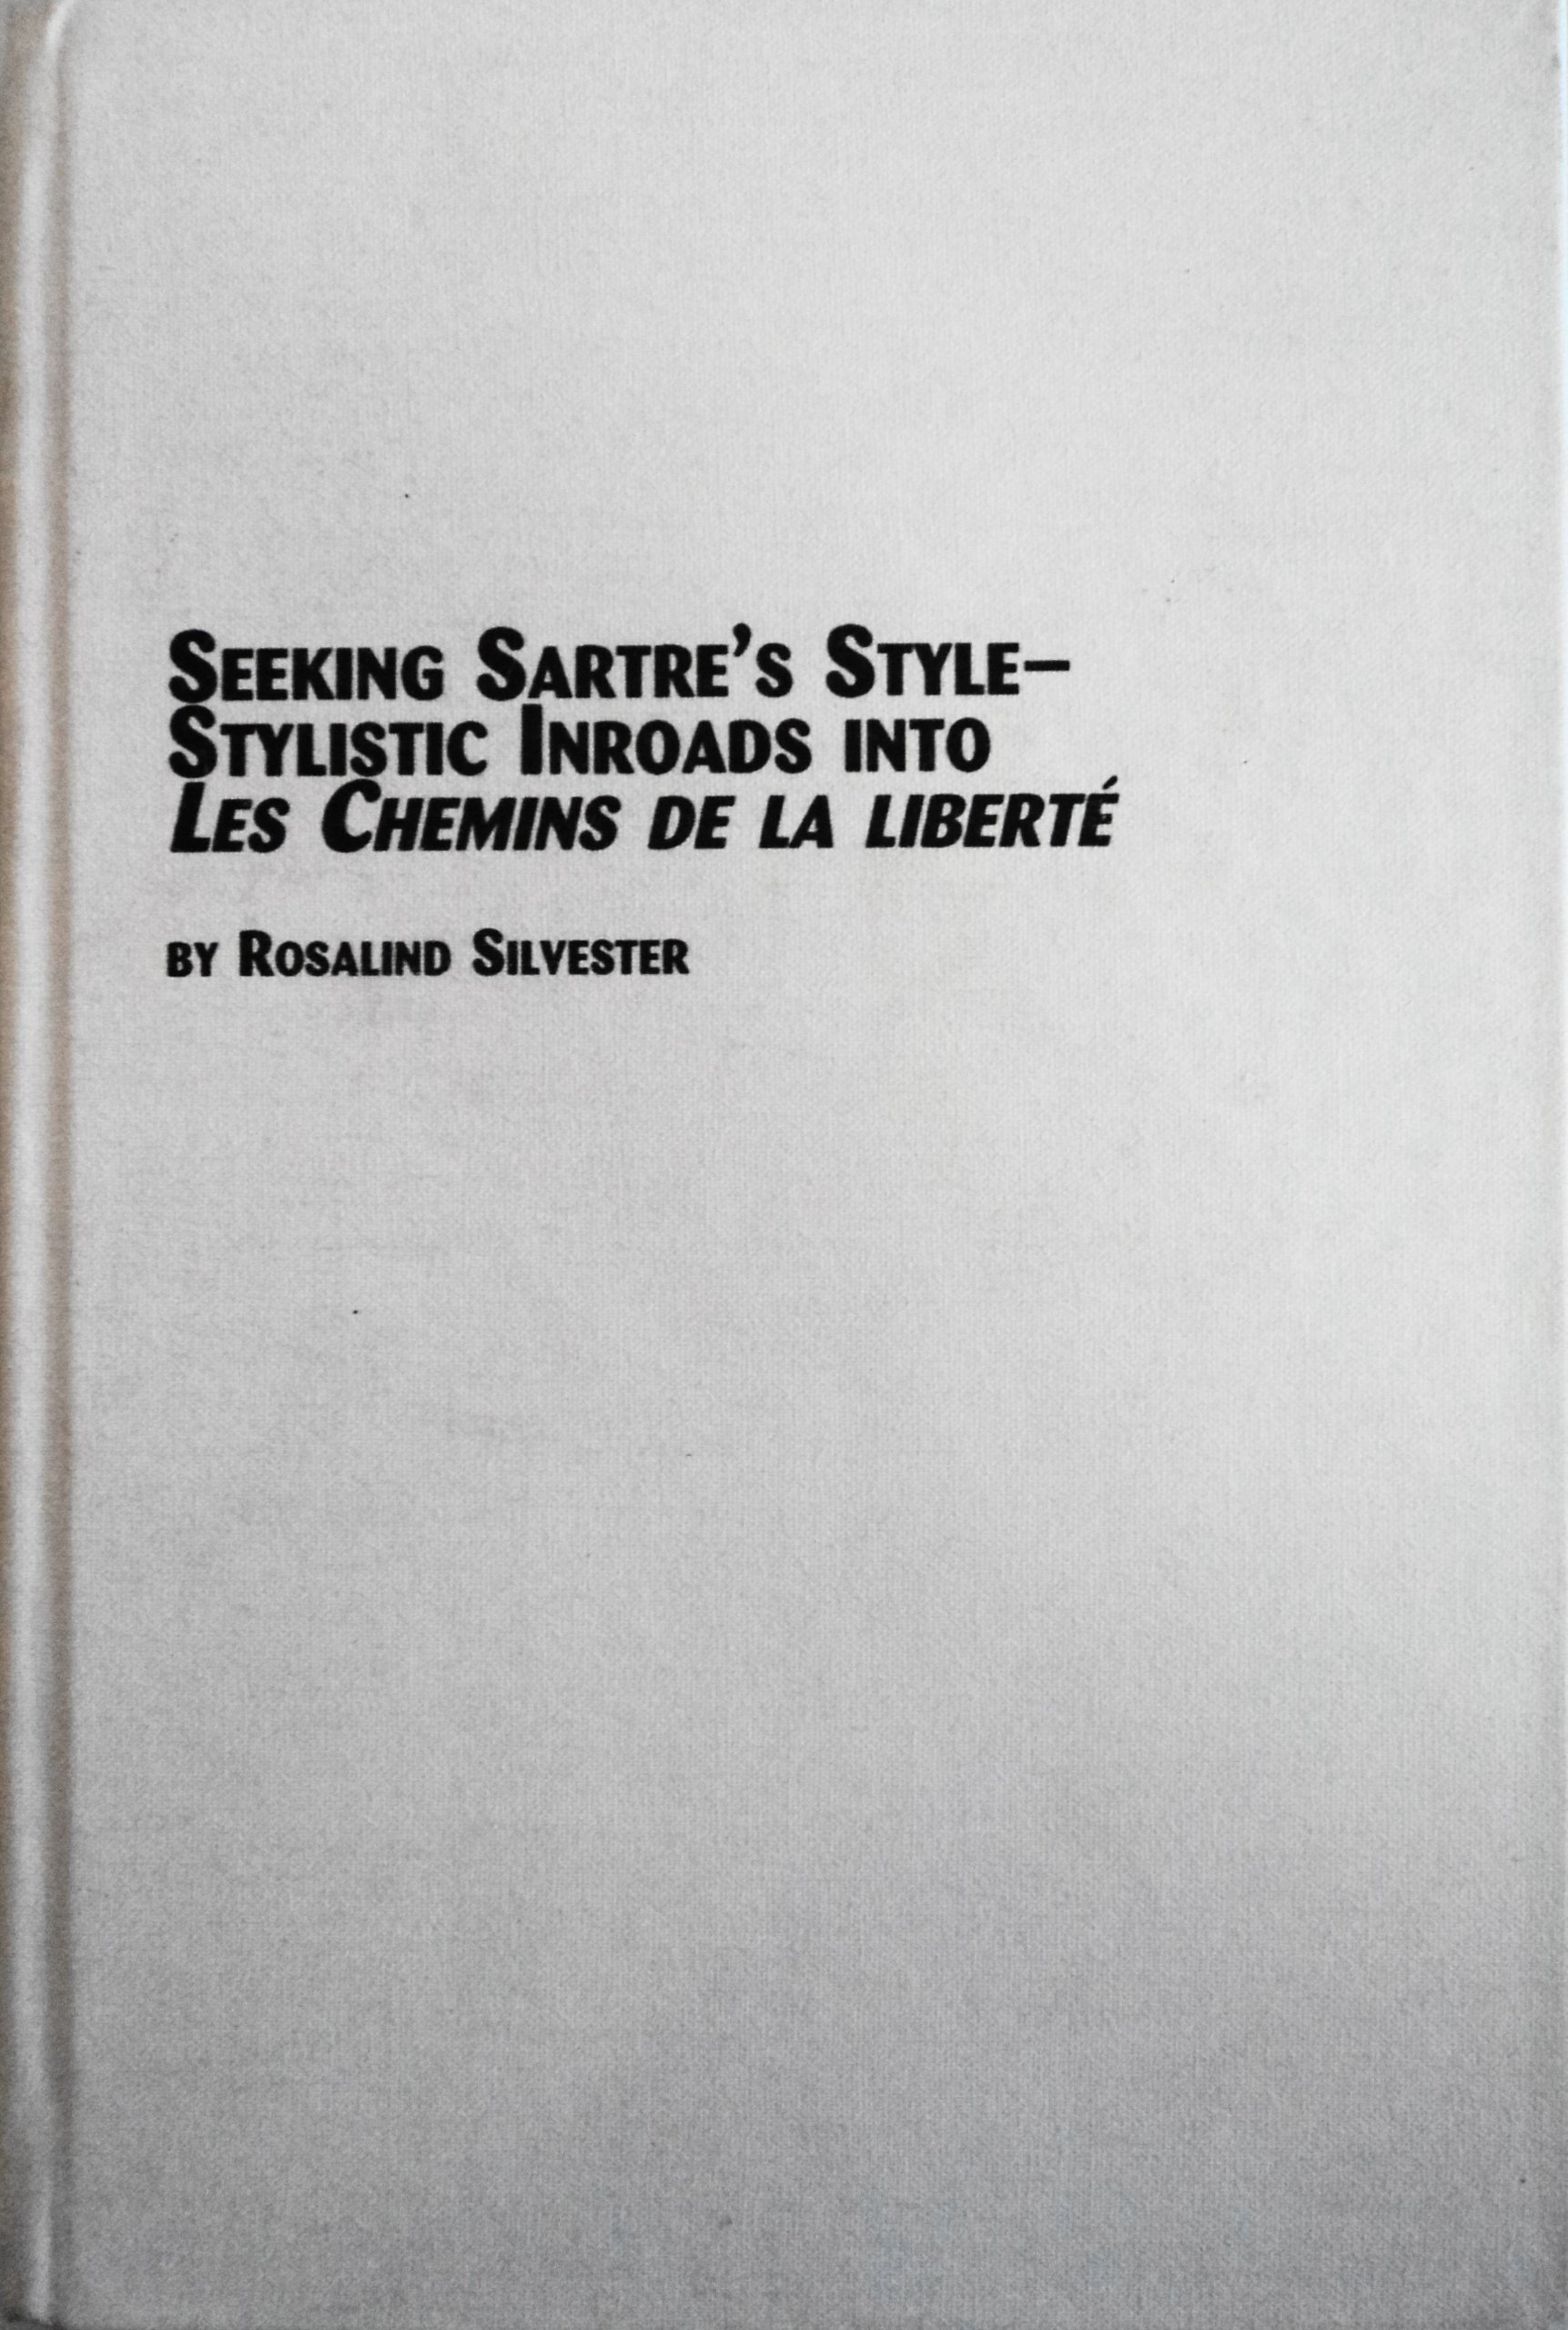 ed93b2600f14 Seeking Sartre s Style - Stylistic Inroads into Les Chemins De La ...